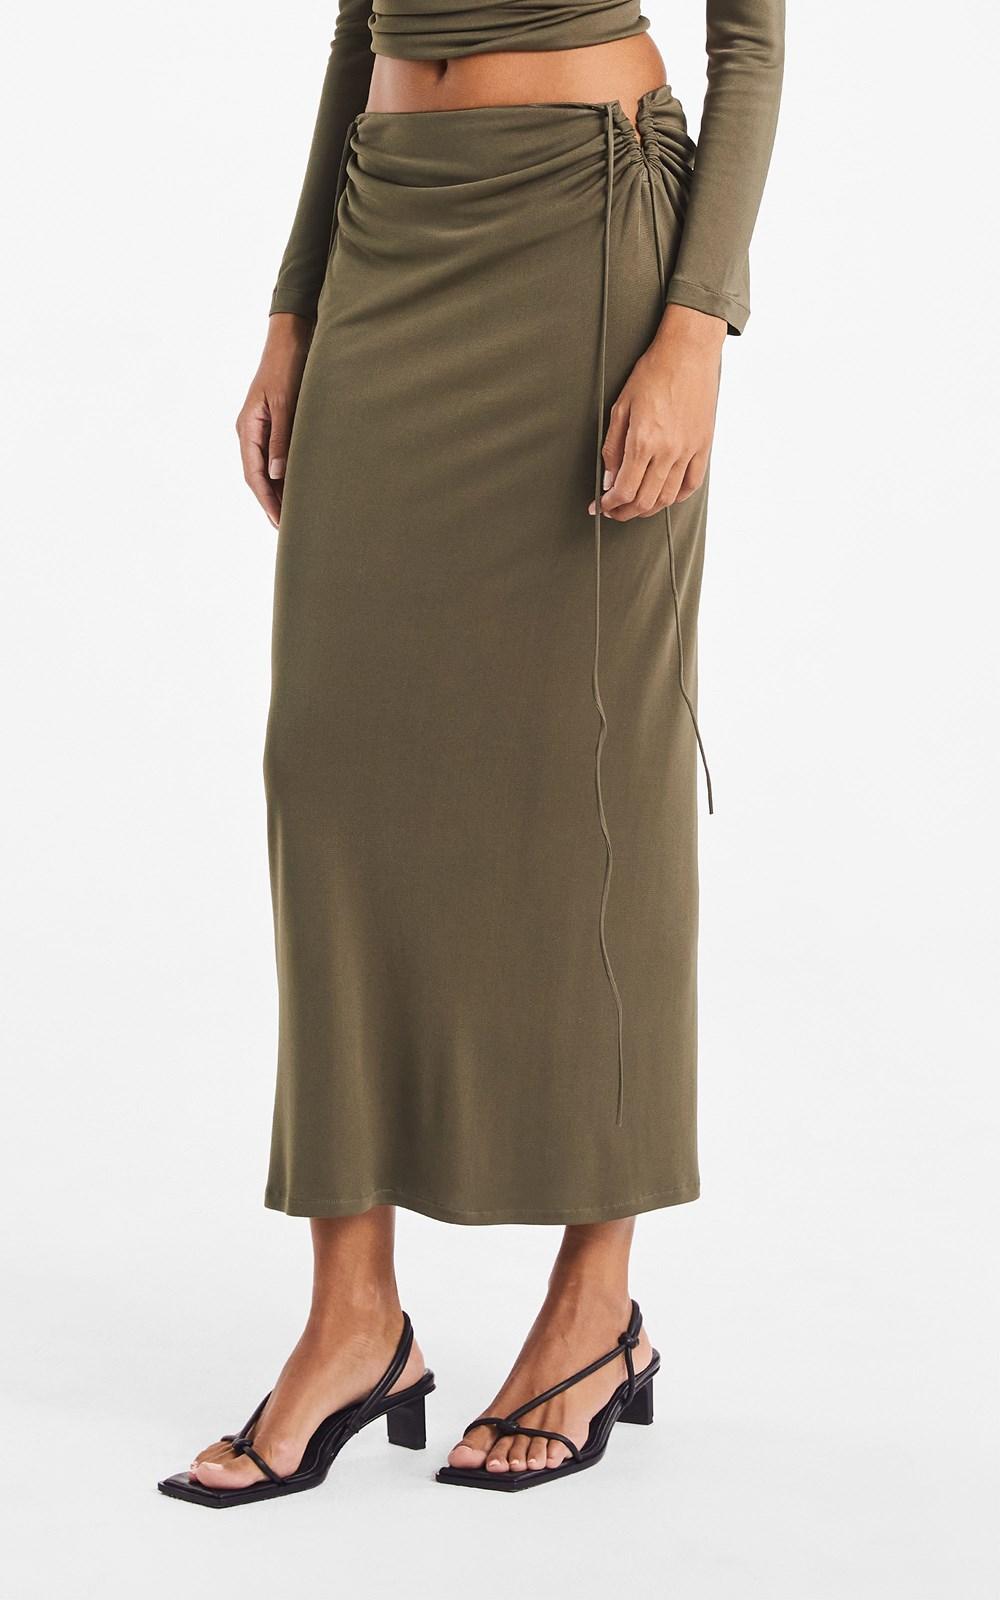 Skirts | WIRE JERSEY SKIRT